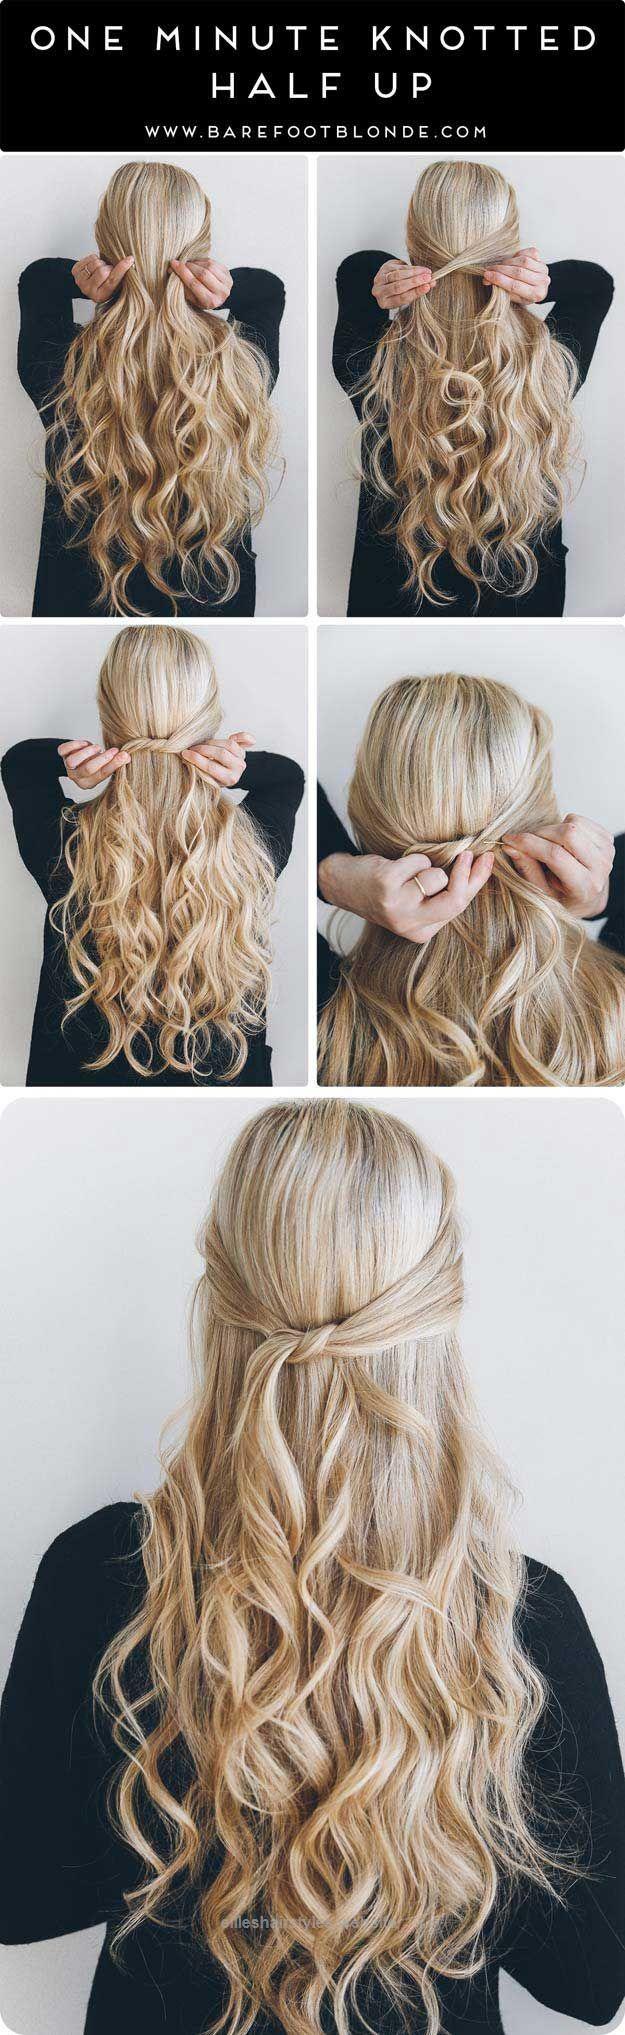 Hair Tutorials Fantastic Amazing Half Up Half Down Hairstyles For